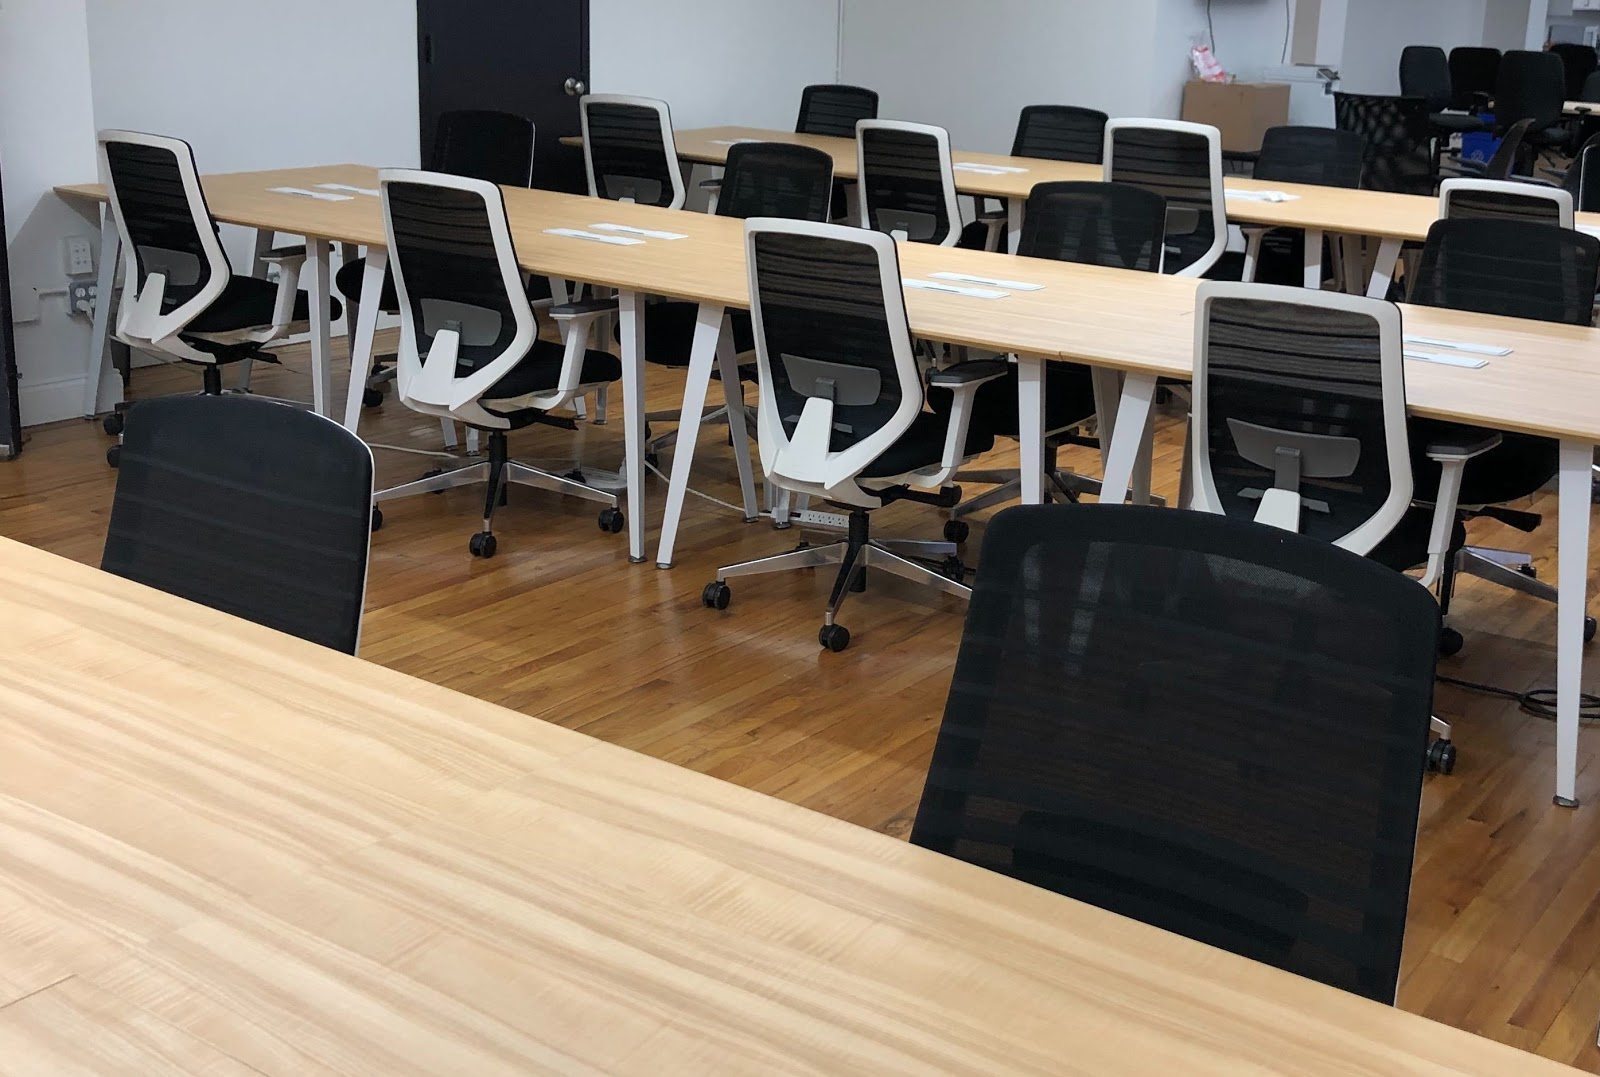 Branch's long desks